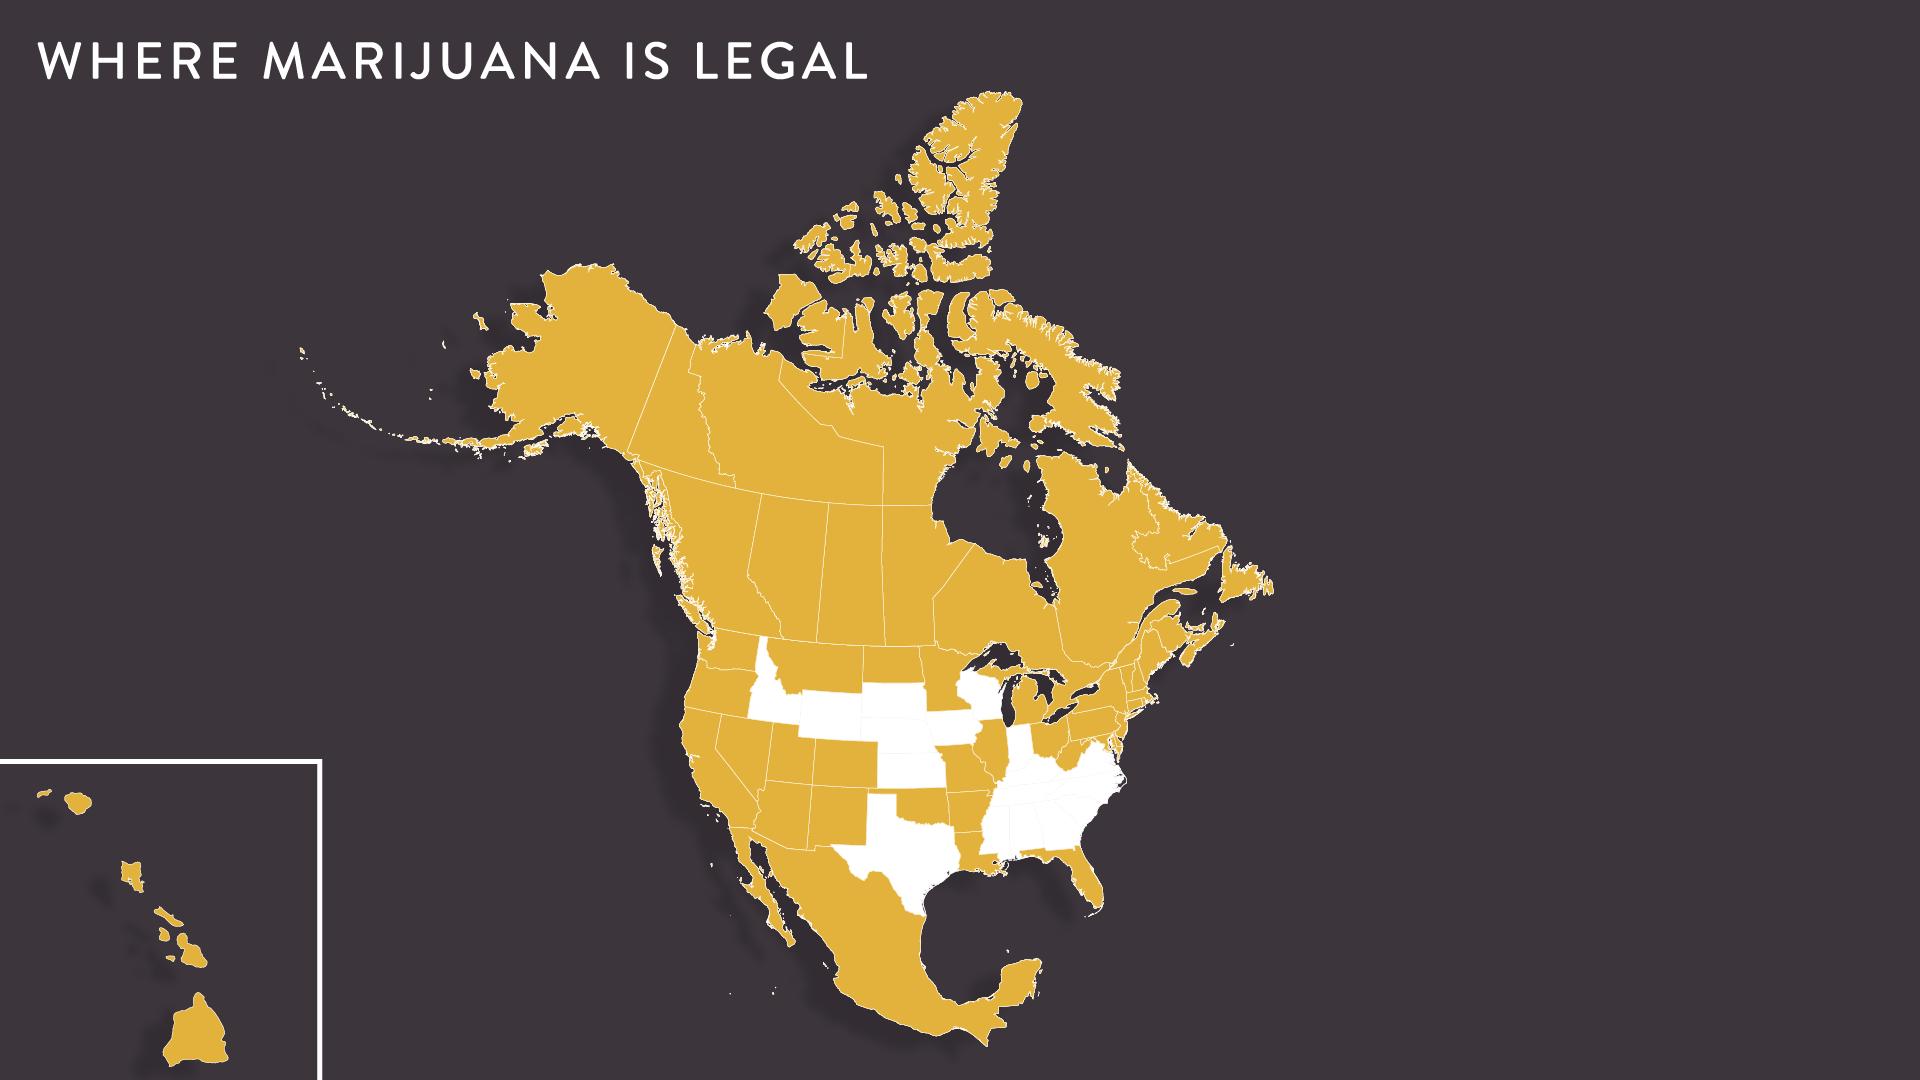 Where Marijuana is Legal